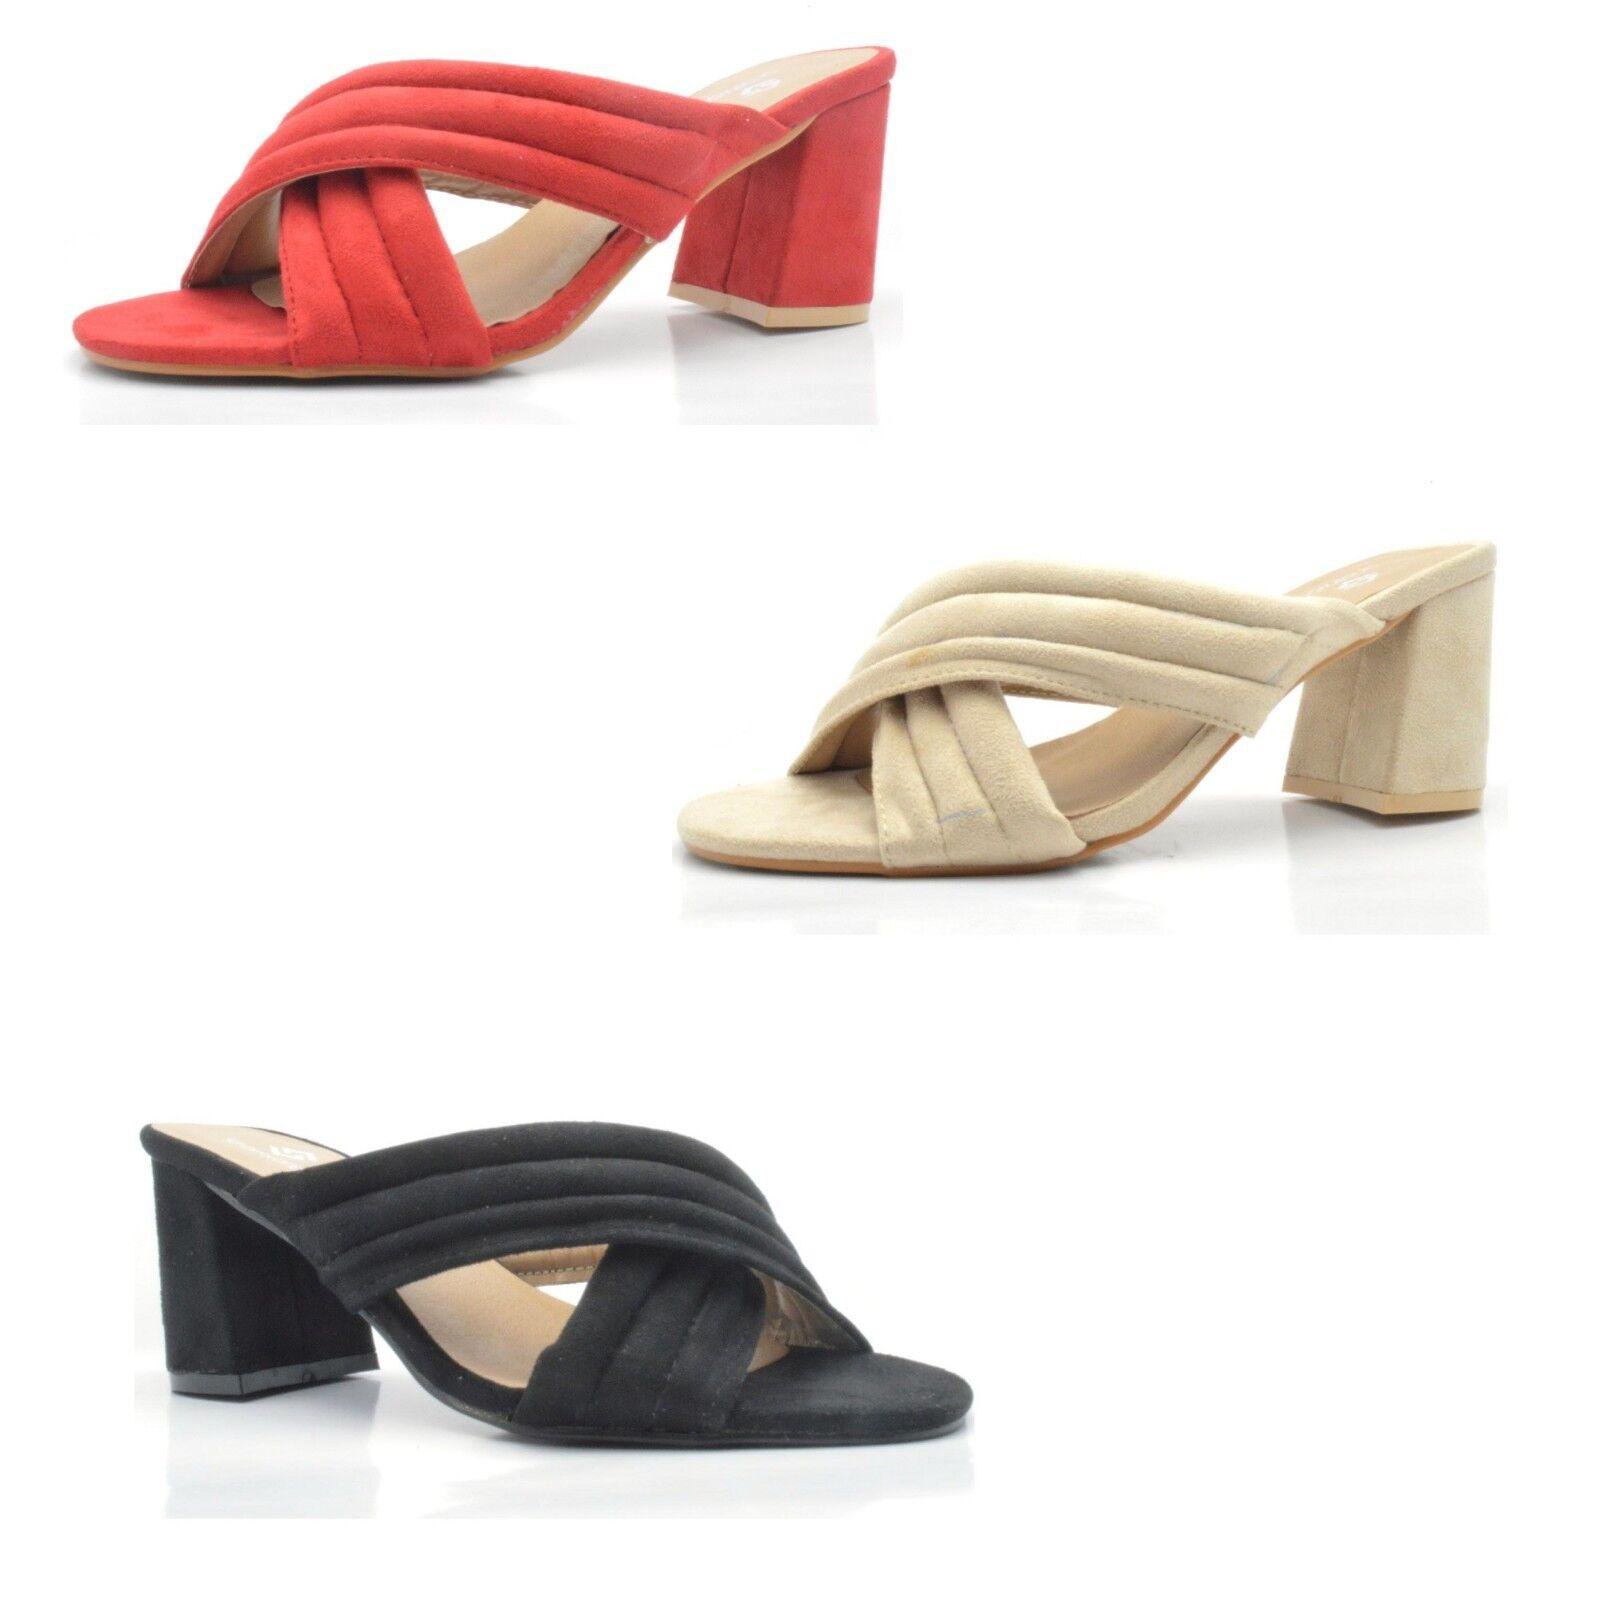 Women's ladies Suede sandals party block high heel mules party sandals sandals slip on 3000-5 247c2a